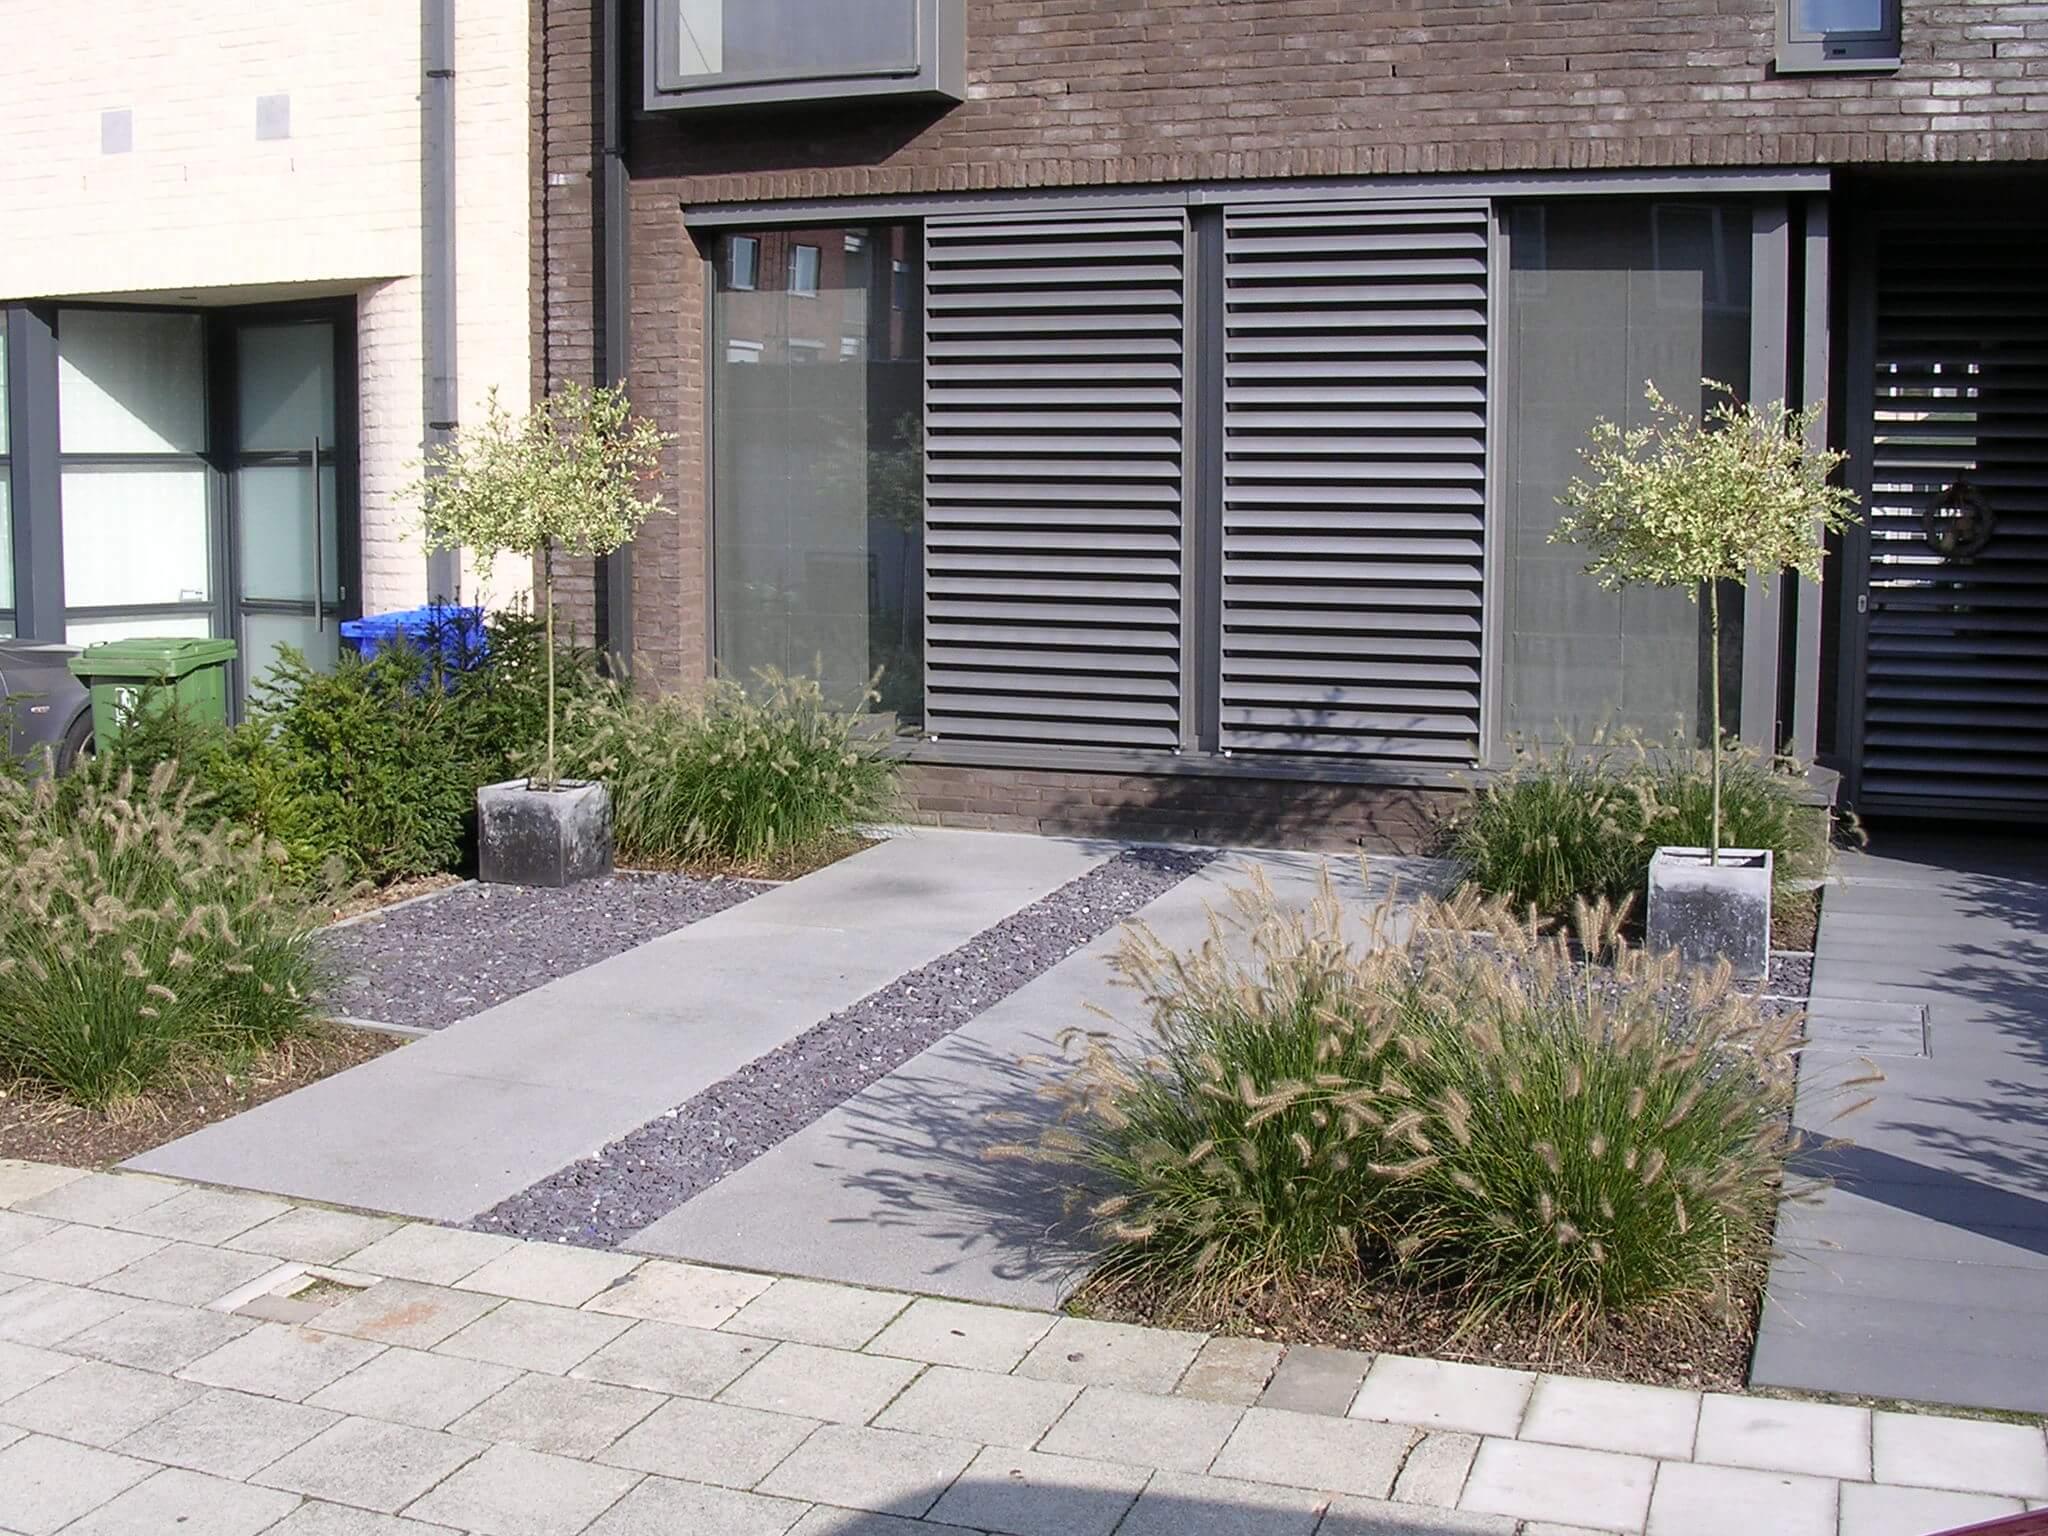 Tuinanleg - Verharding - Wyckmans Wim Tuinarchitectuur bvba